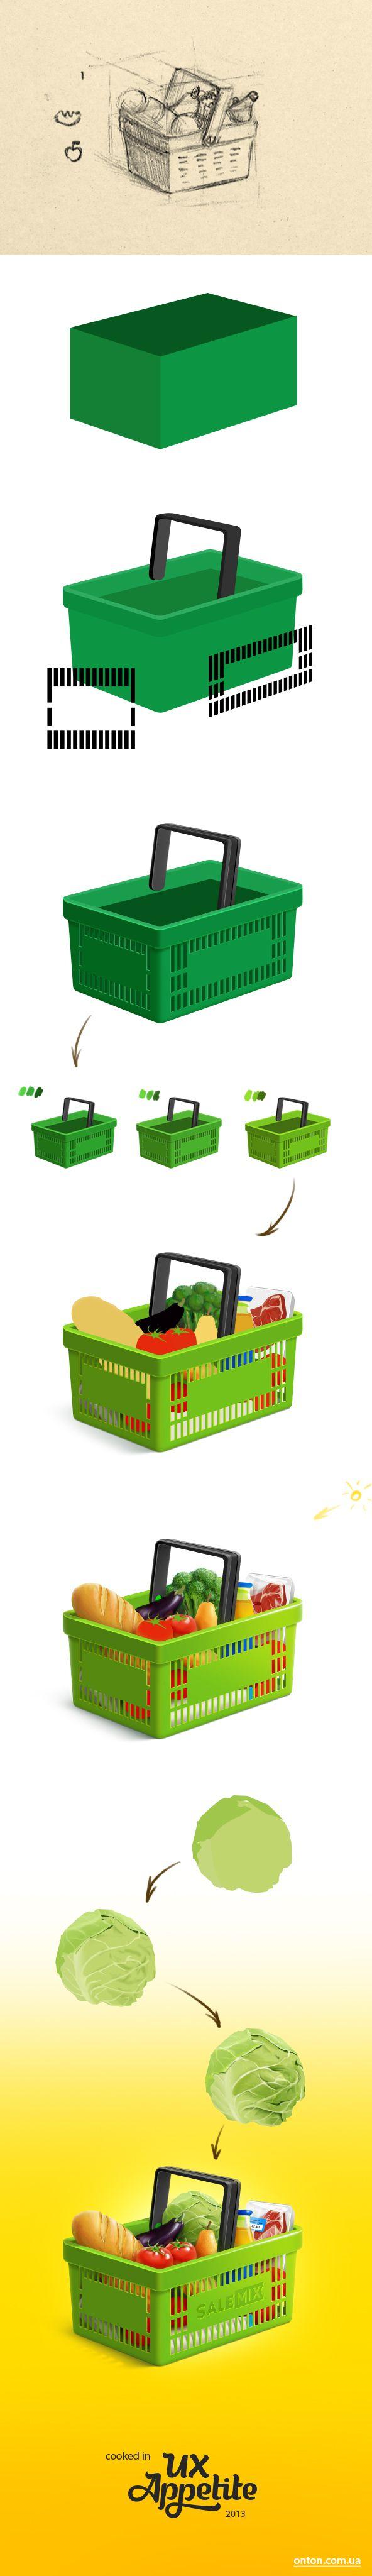 Process of drawing shoping cart for @salemixua  On dribbble: http://dribbble.com/shots/1151397-Shoping-cart  WIP in Behance: http://www.behance.net/wip/194321/373677